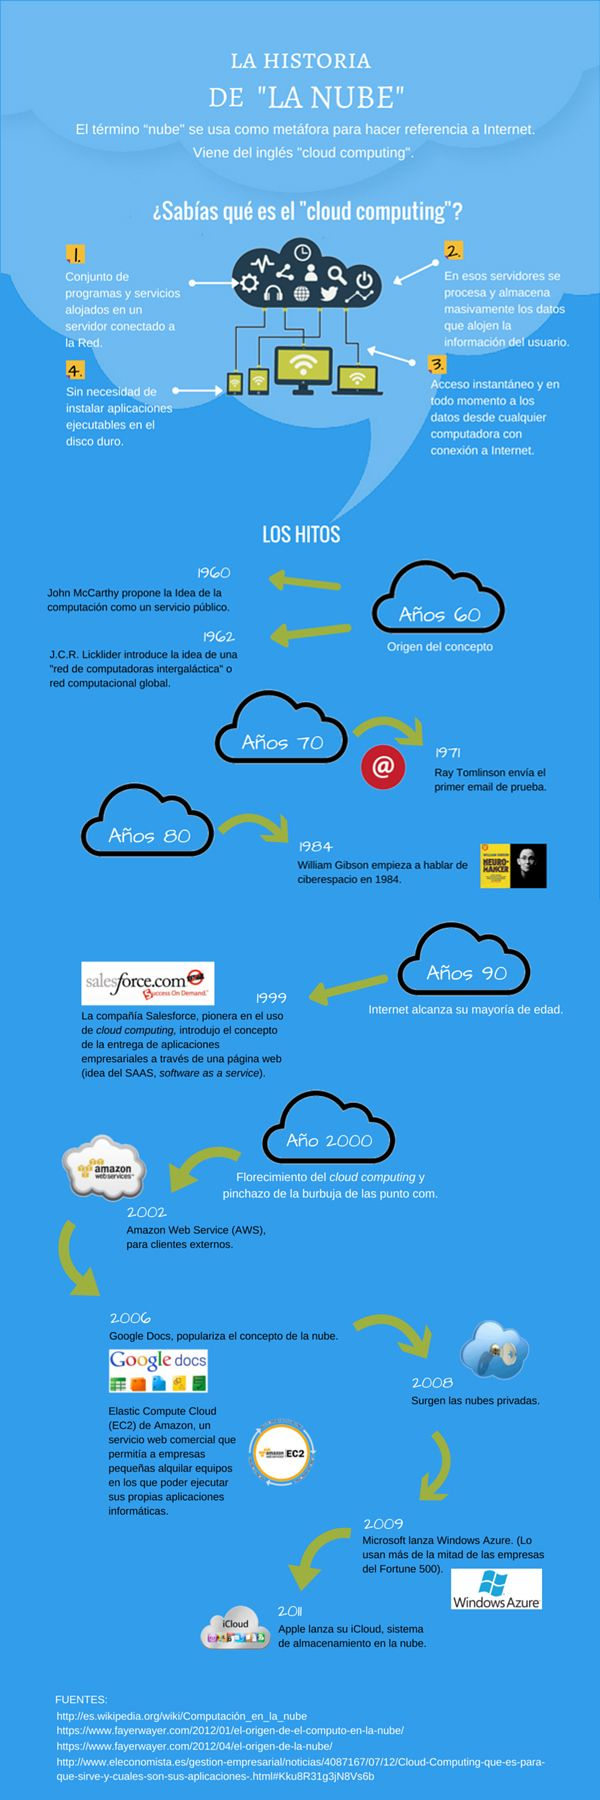 HISTORIA DE LA NUBE Y EL CLOUD COMPUTING #INFOGRAFIA #INFOGRAPHIC #CLOUDCOMPUTING